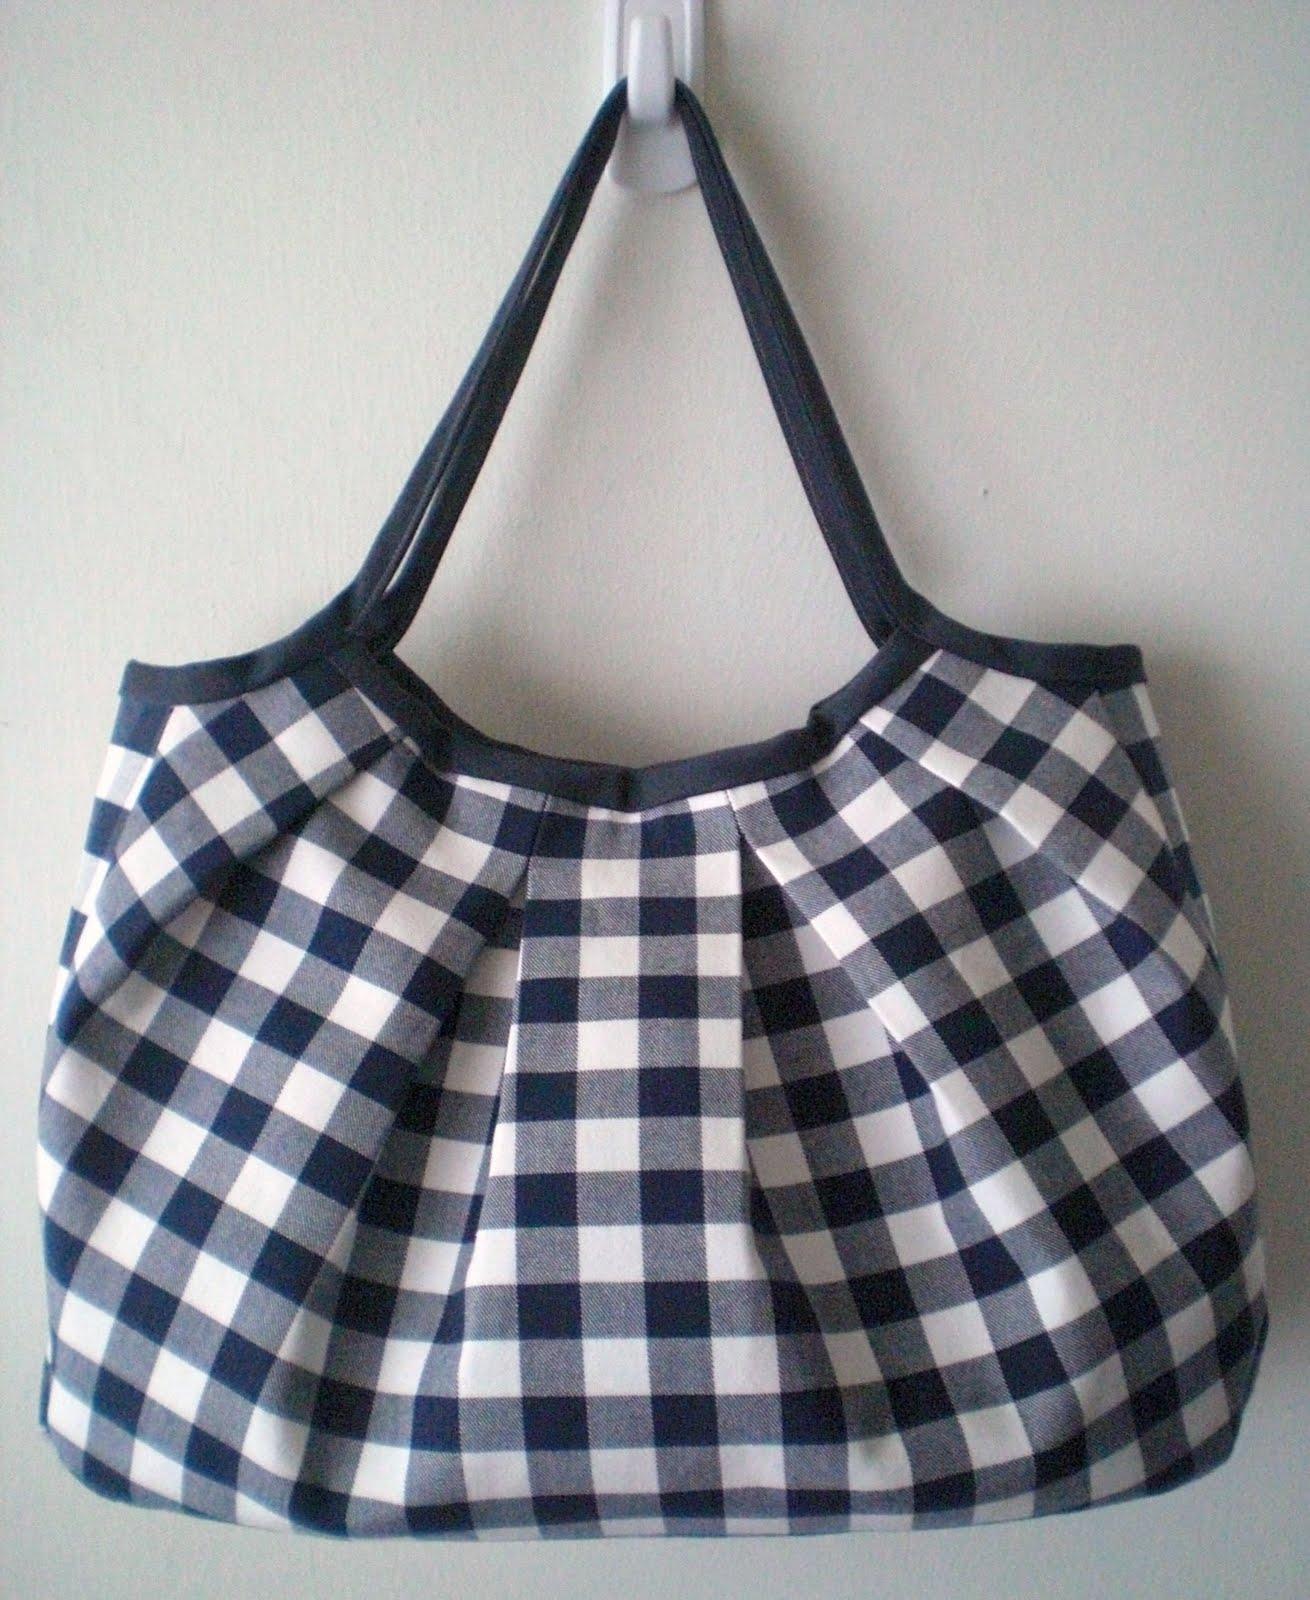 Granny Bags